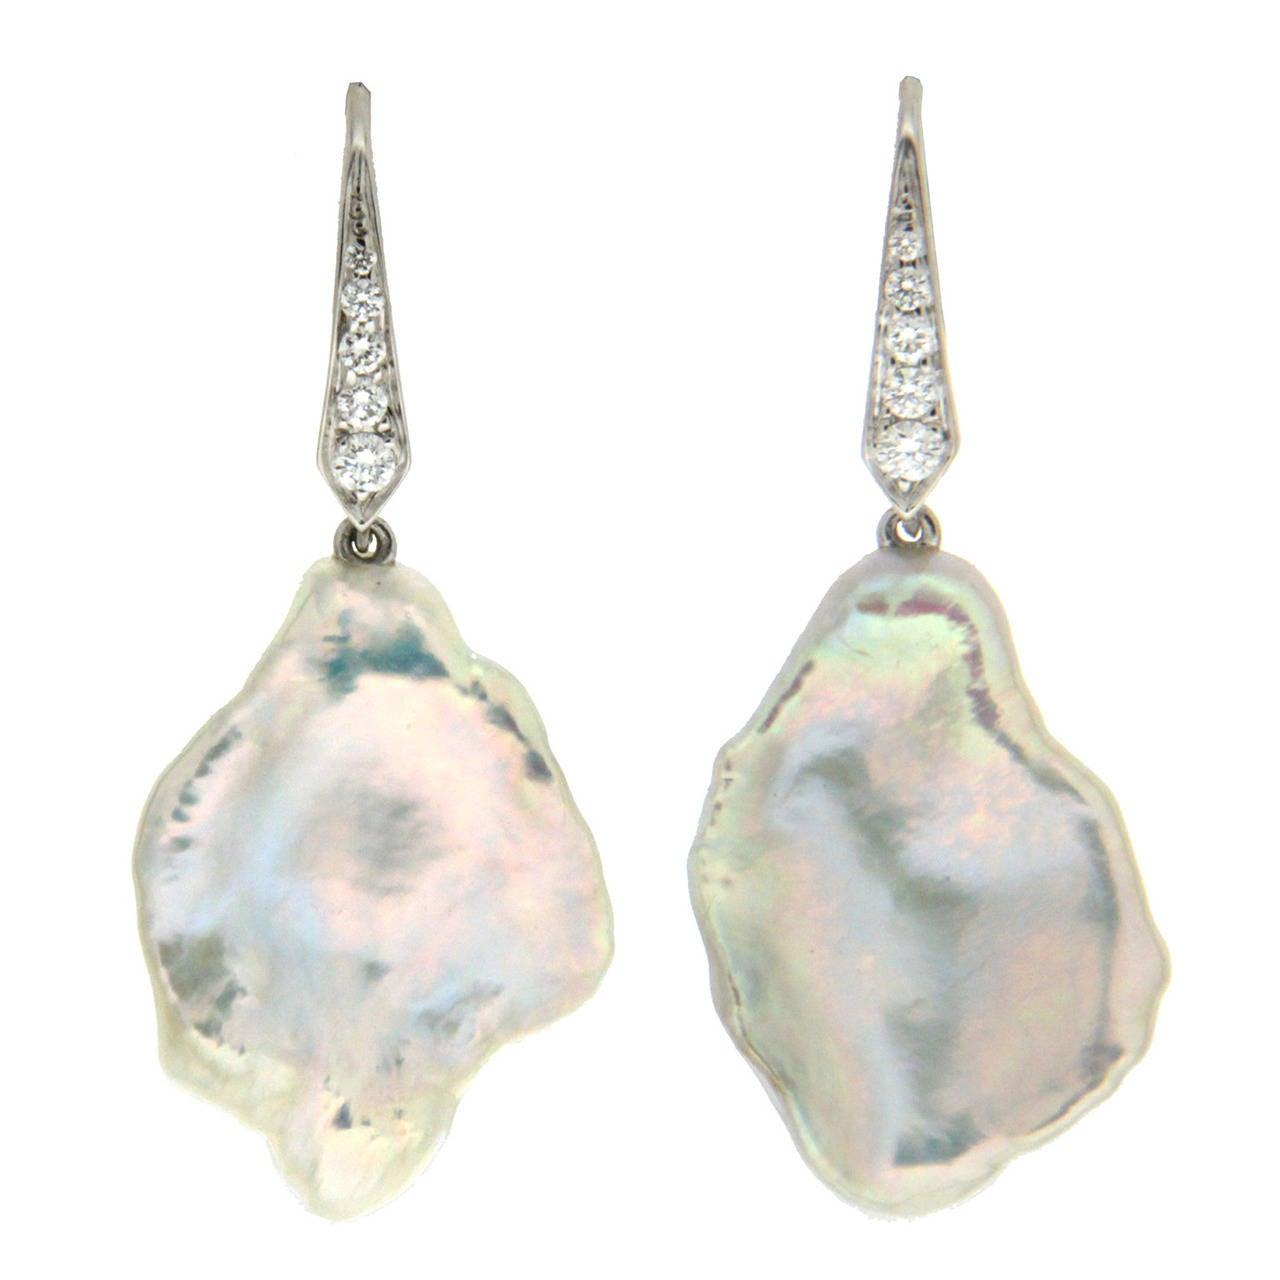 Valentin Magro Freshwater Pearl Diamond Gold Drop Earrings 1